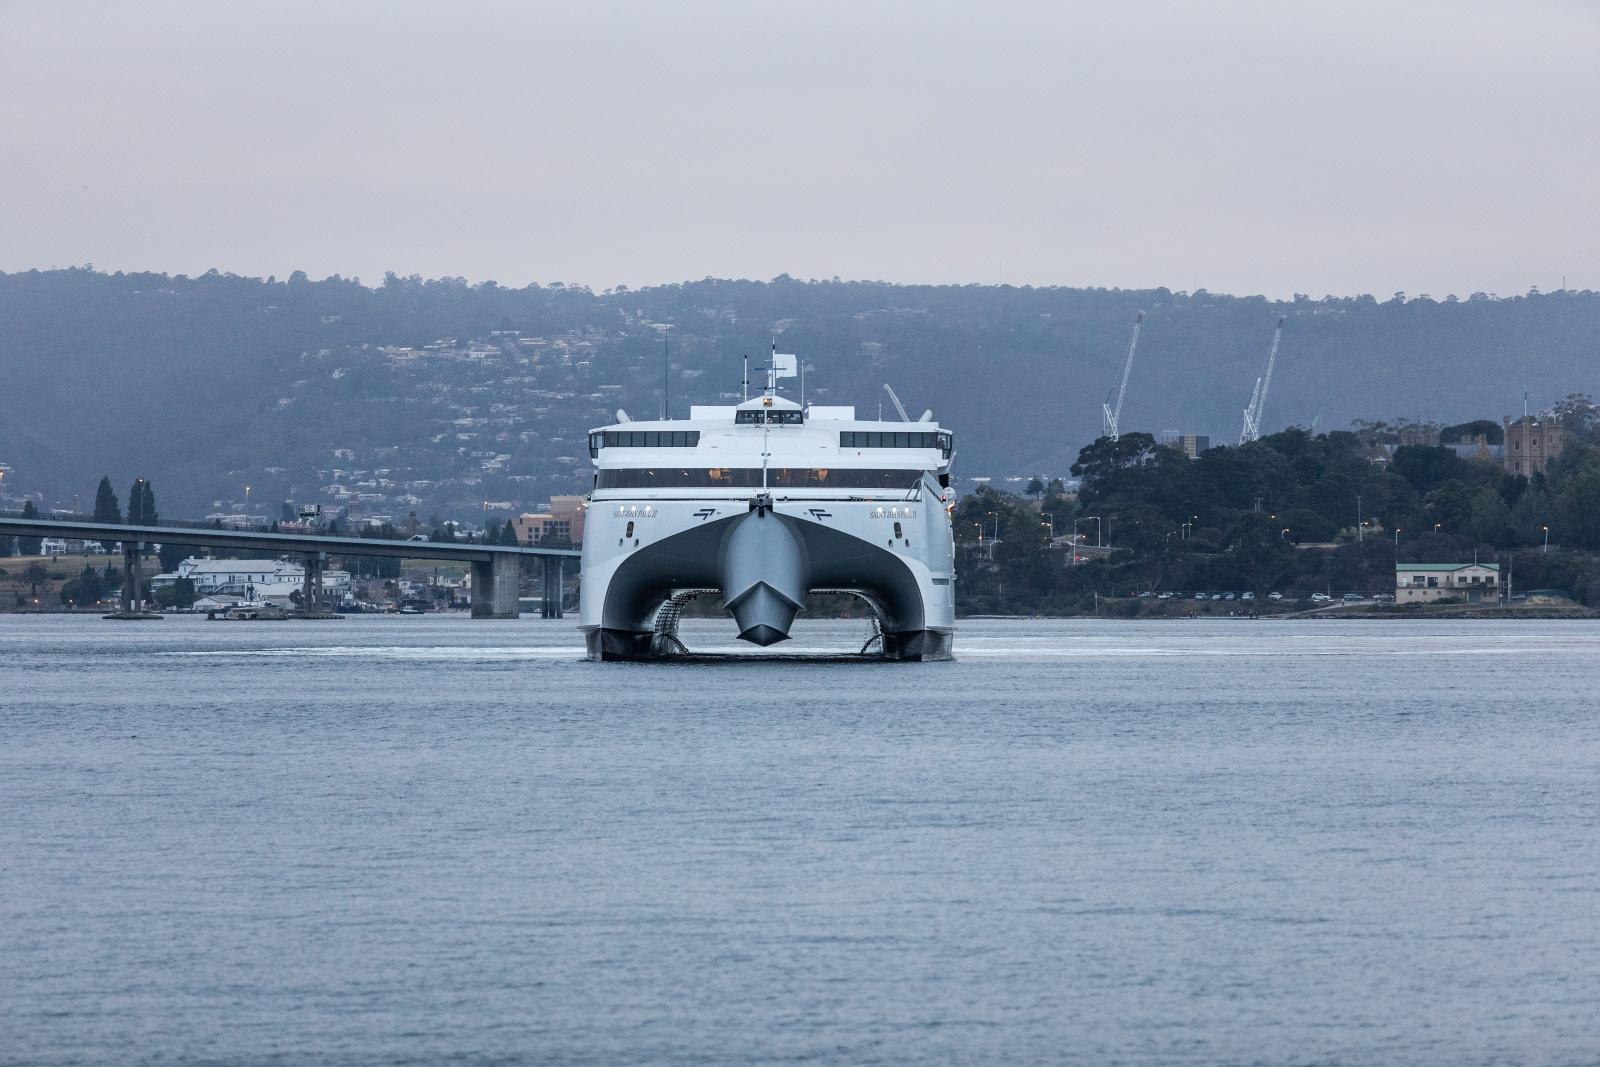 Commercial maritime prospectus photo